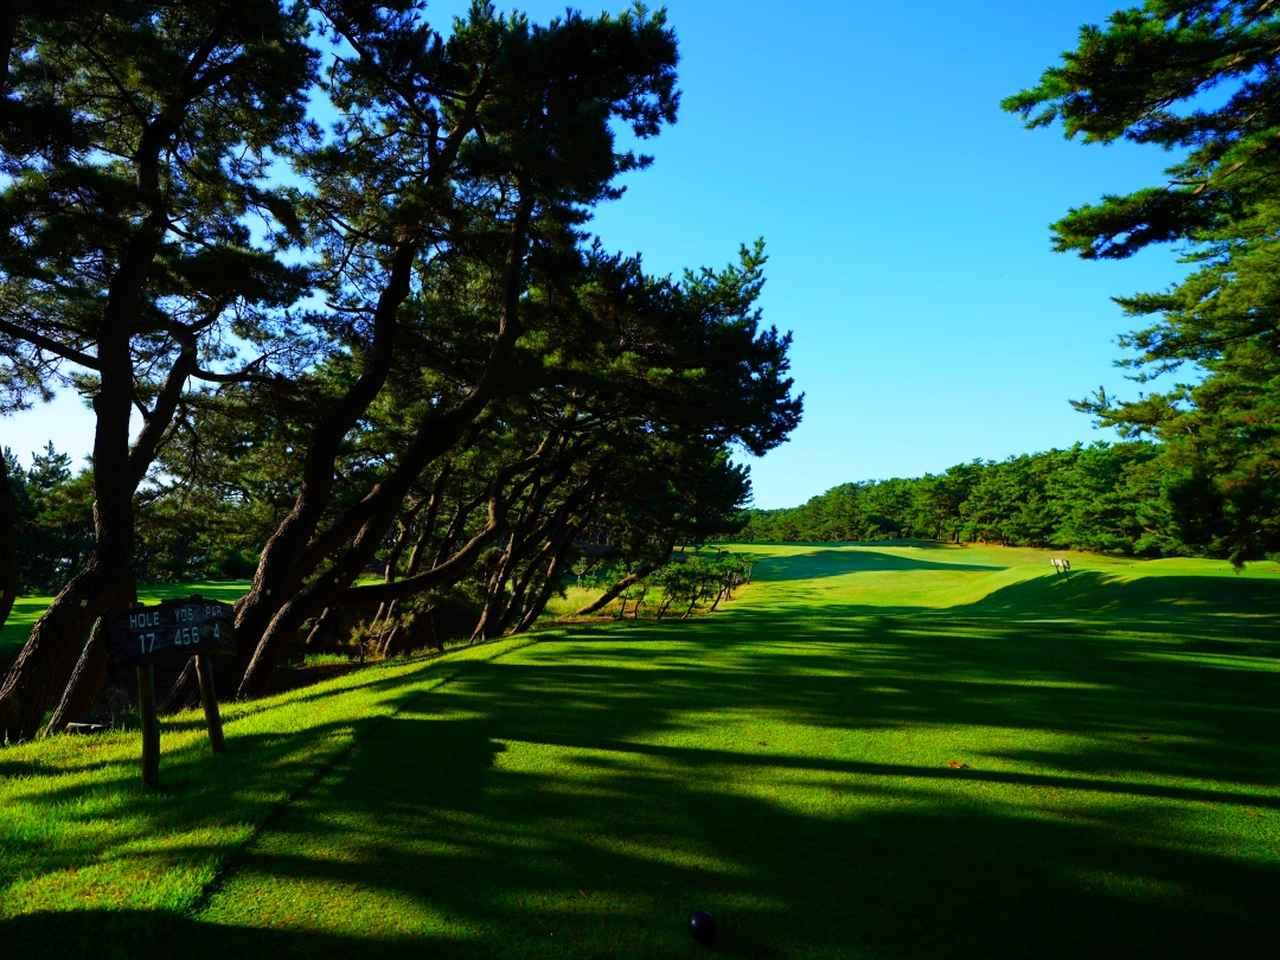 Images : 2番目の画像 - 大洗ゴルフ倶楽部 - ゴルフへ行こうWEB by ゴルフダイジェスト